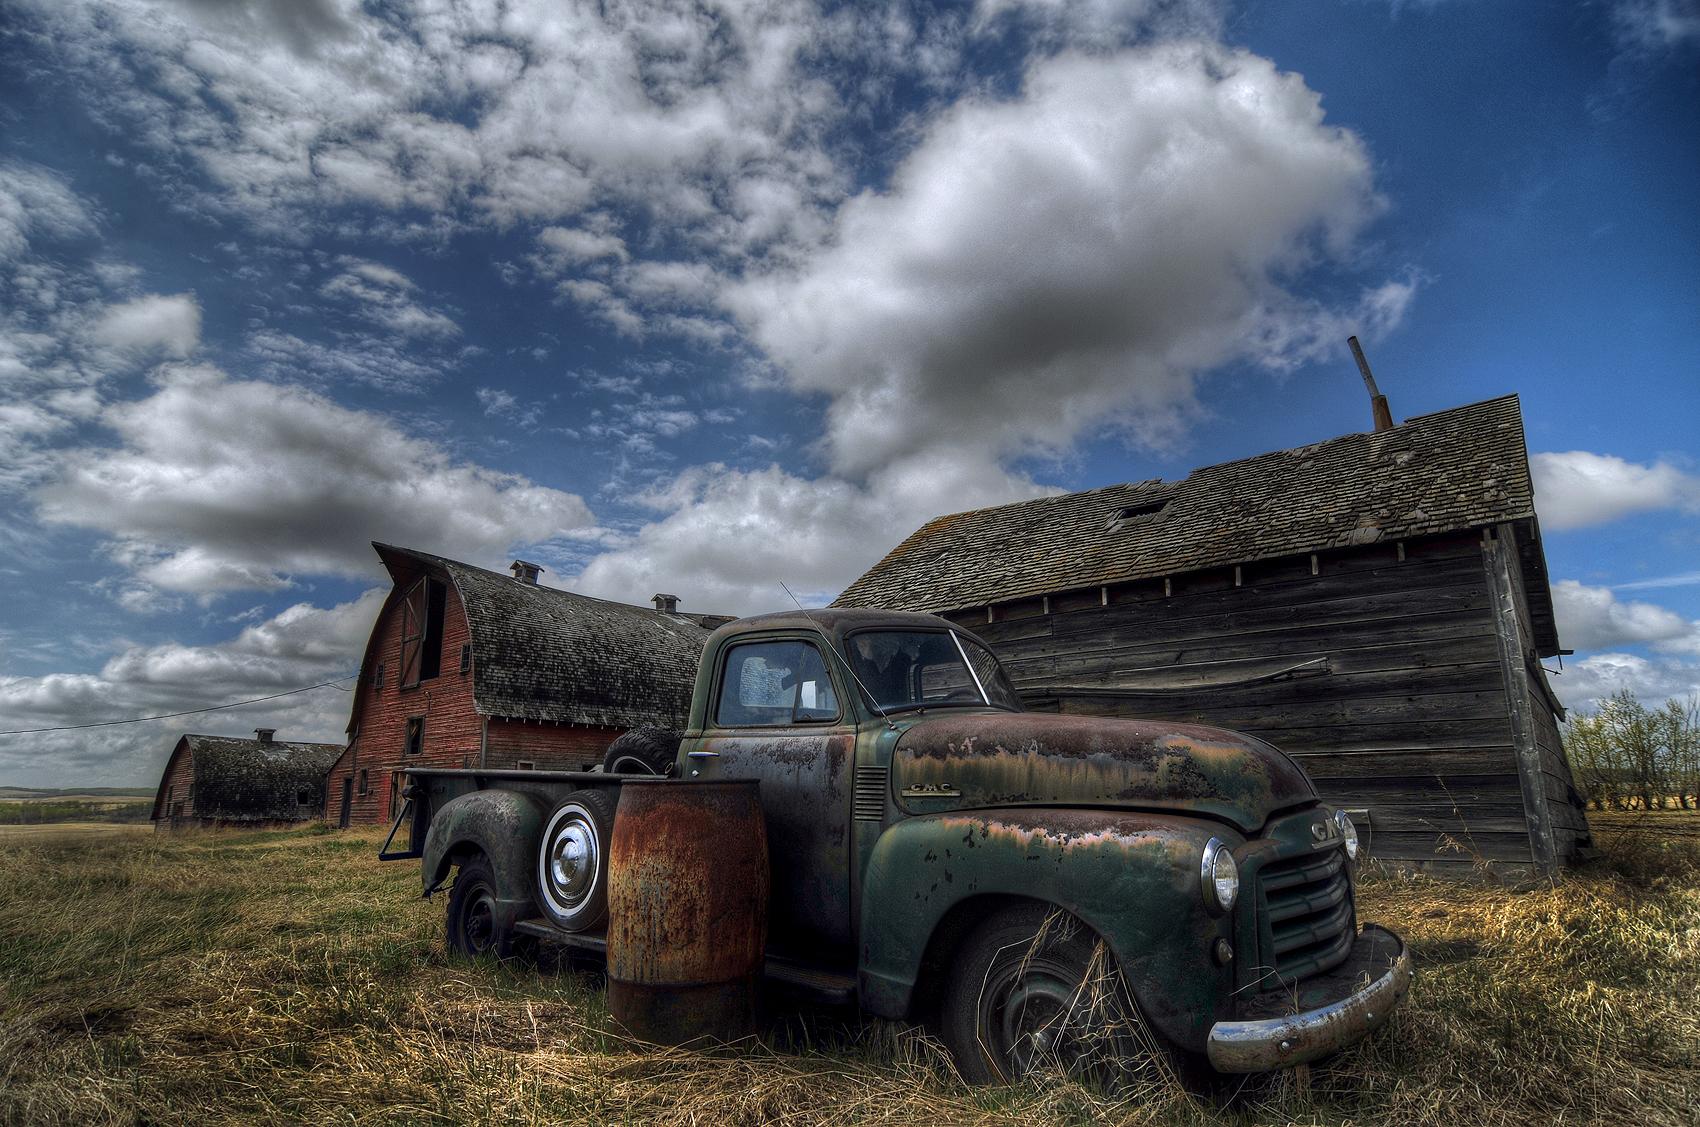 Wallpaper : Old, Car, Abandoned, Sky, Vehicle, Farm